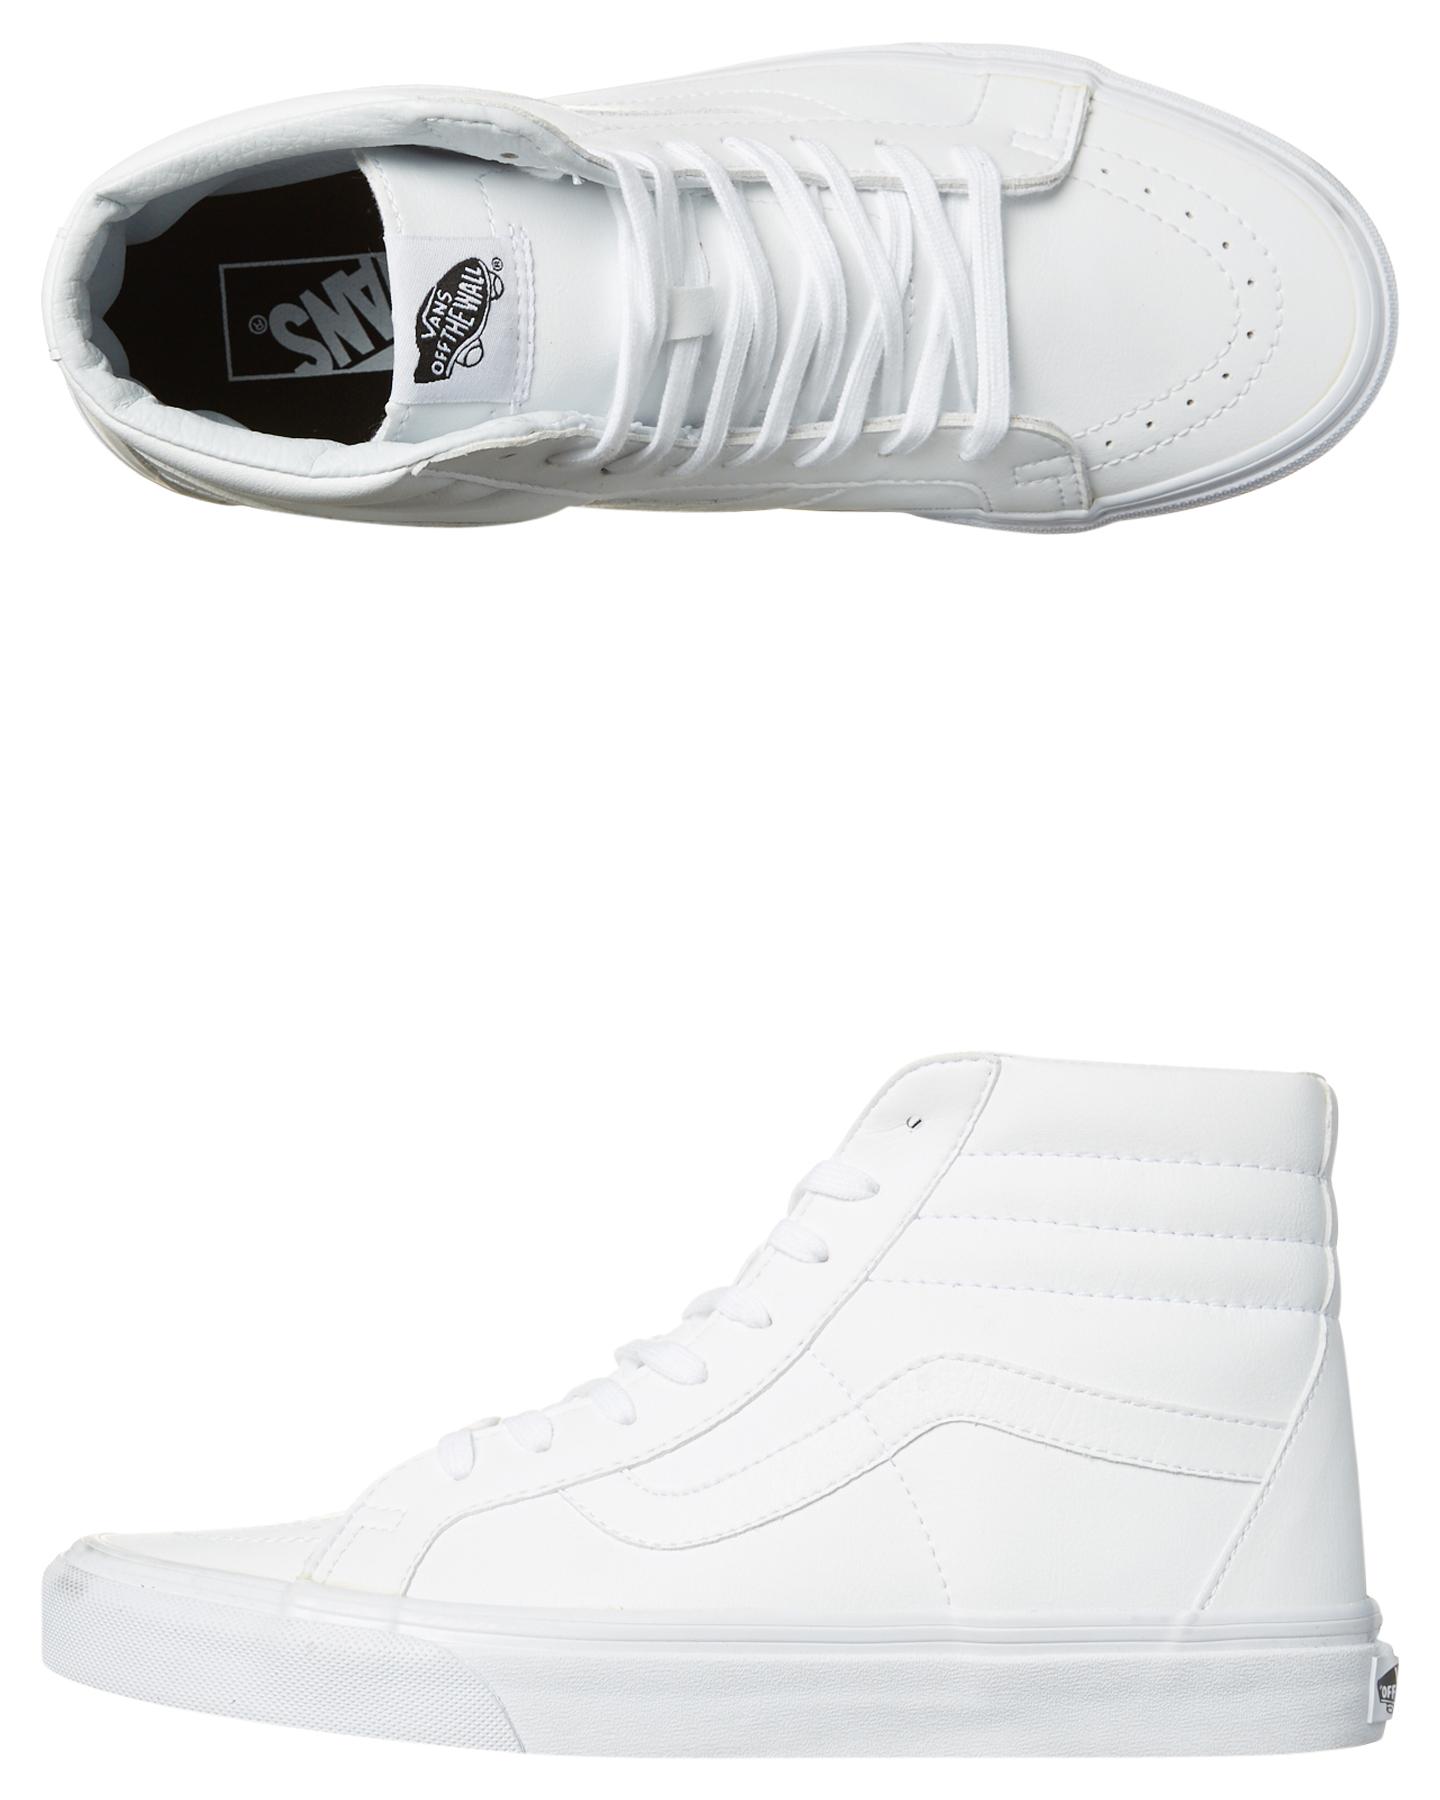 0bd9239f8cf Vans Mens Sk8 Hi Reissue Leather Shoe - White